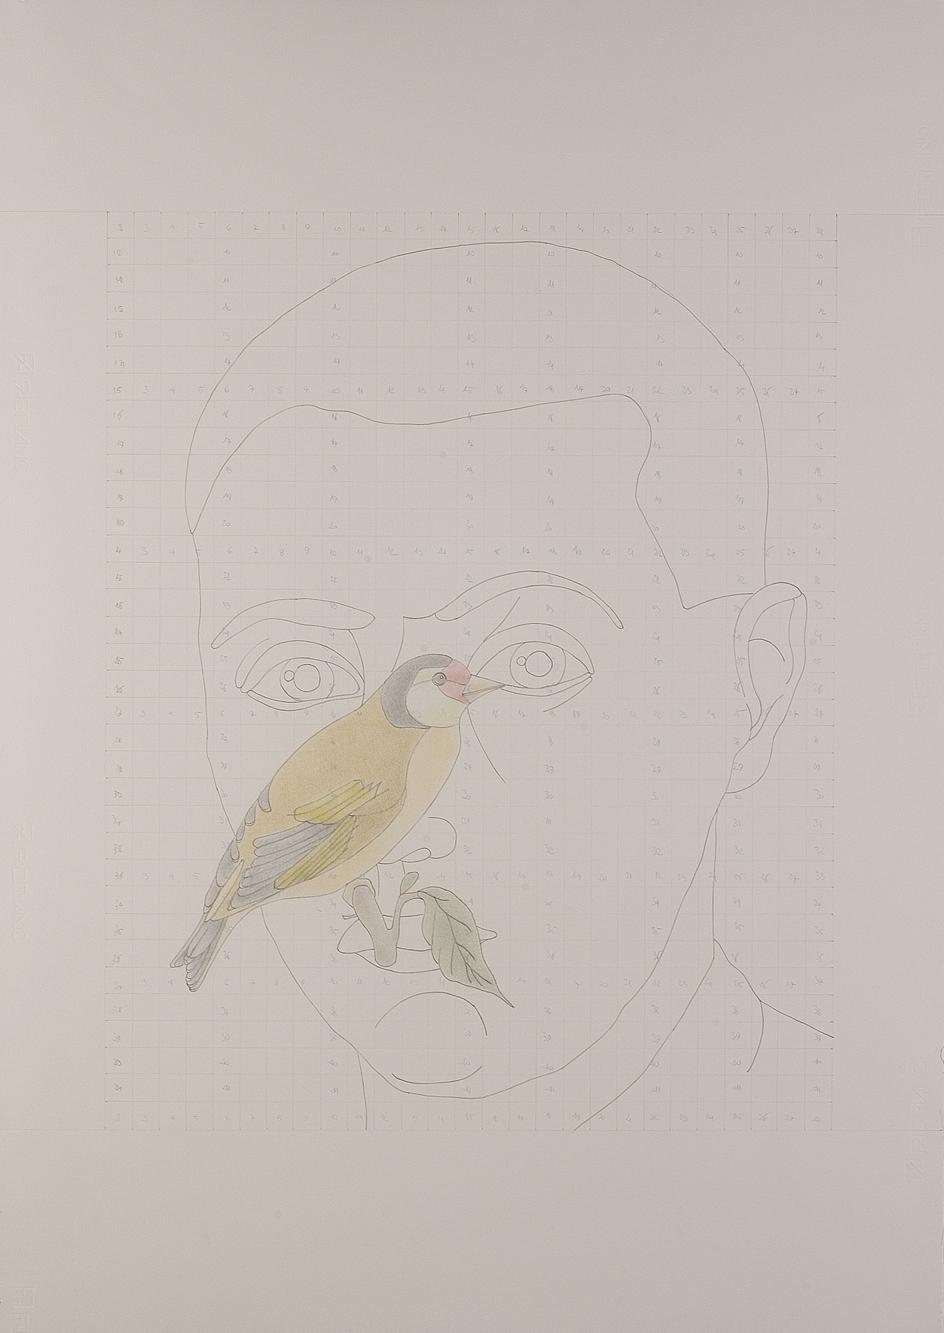 """Un mattino"" 2009, matita su carta, 100 x 70 cm"